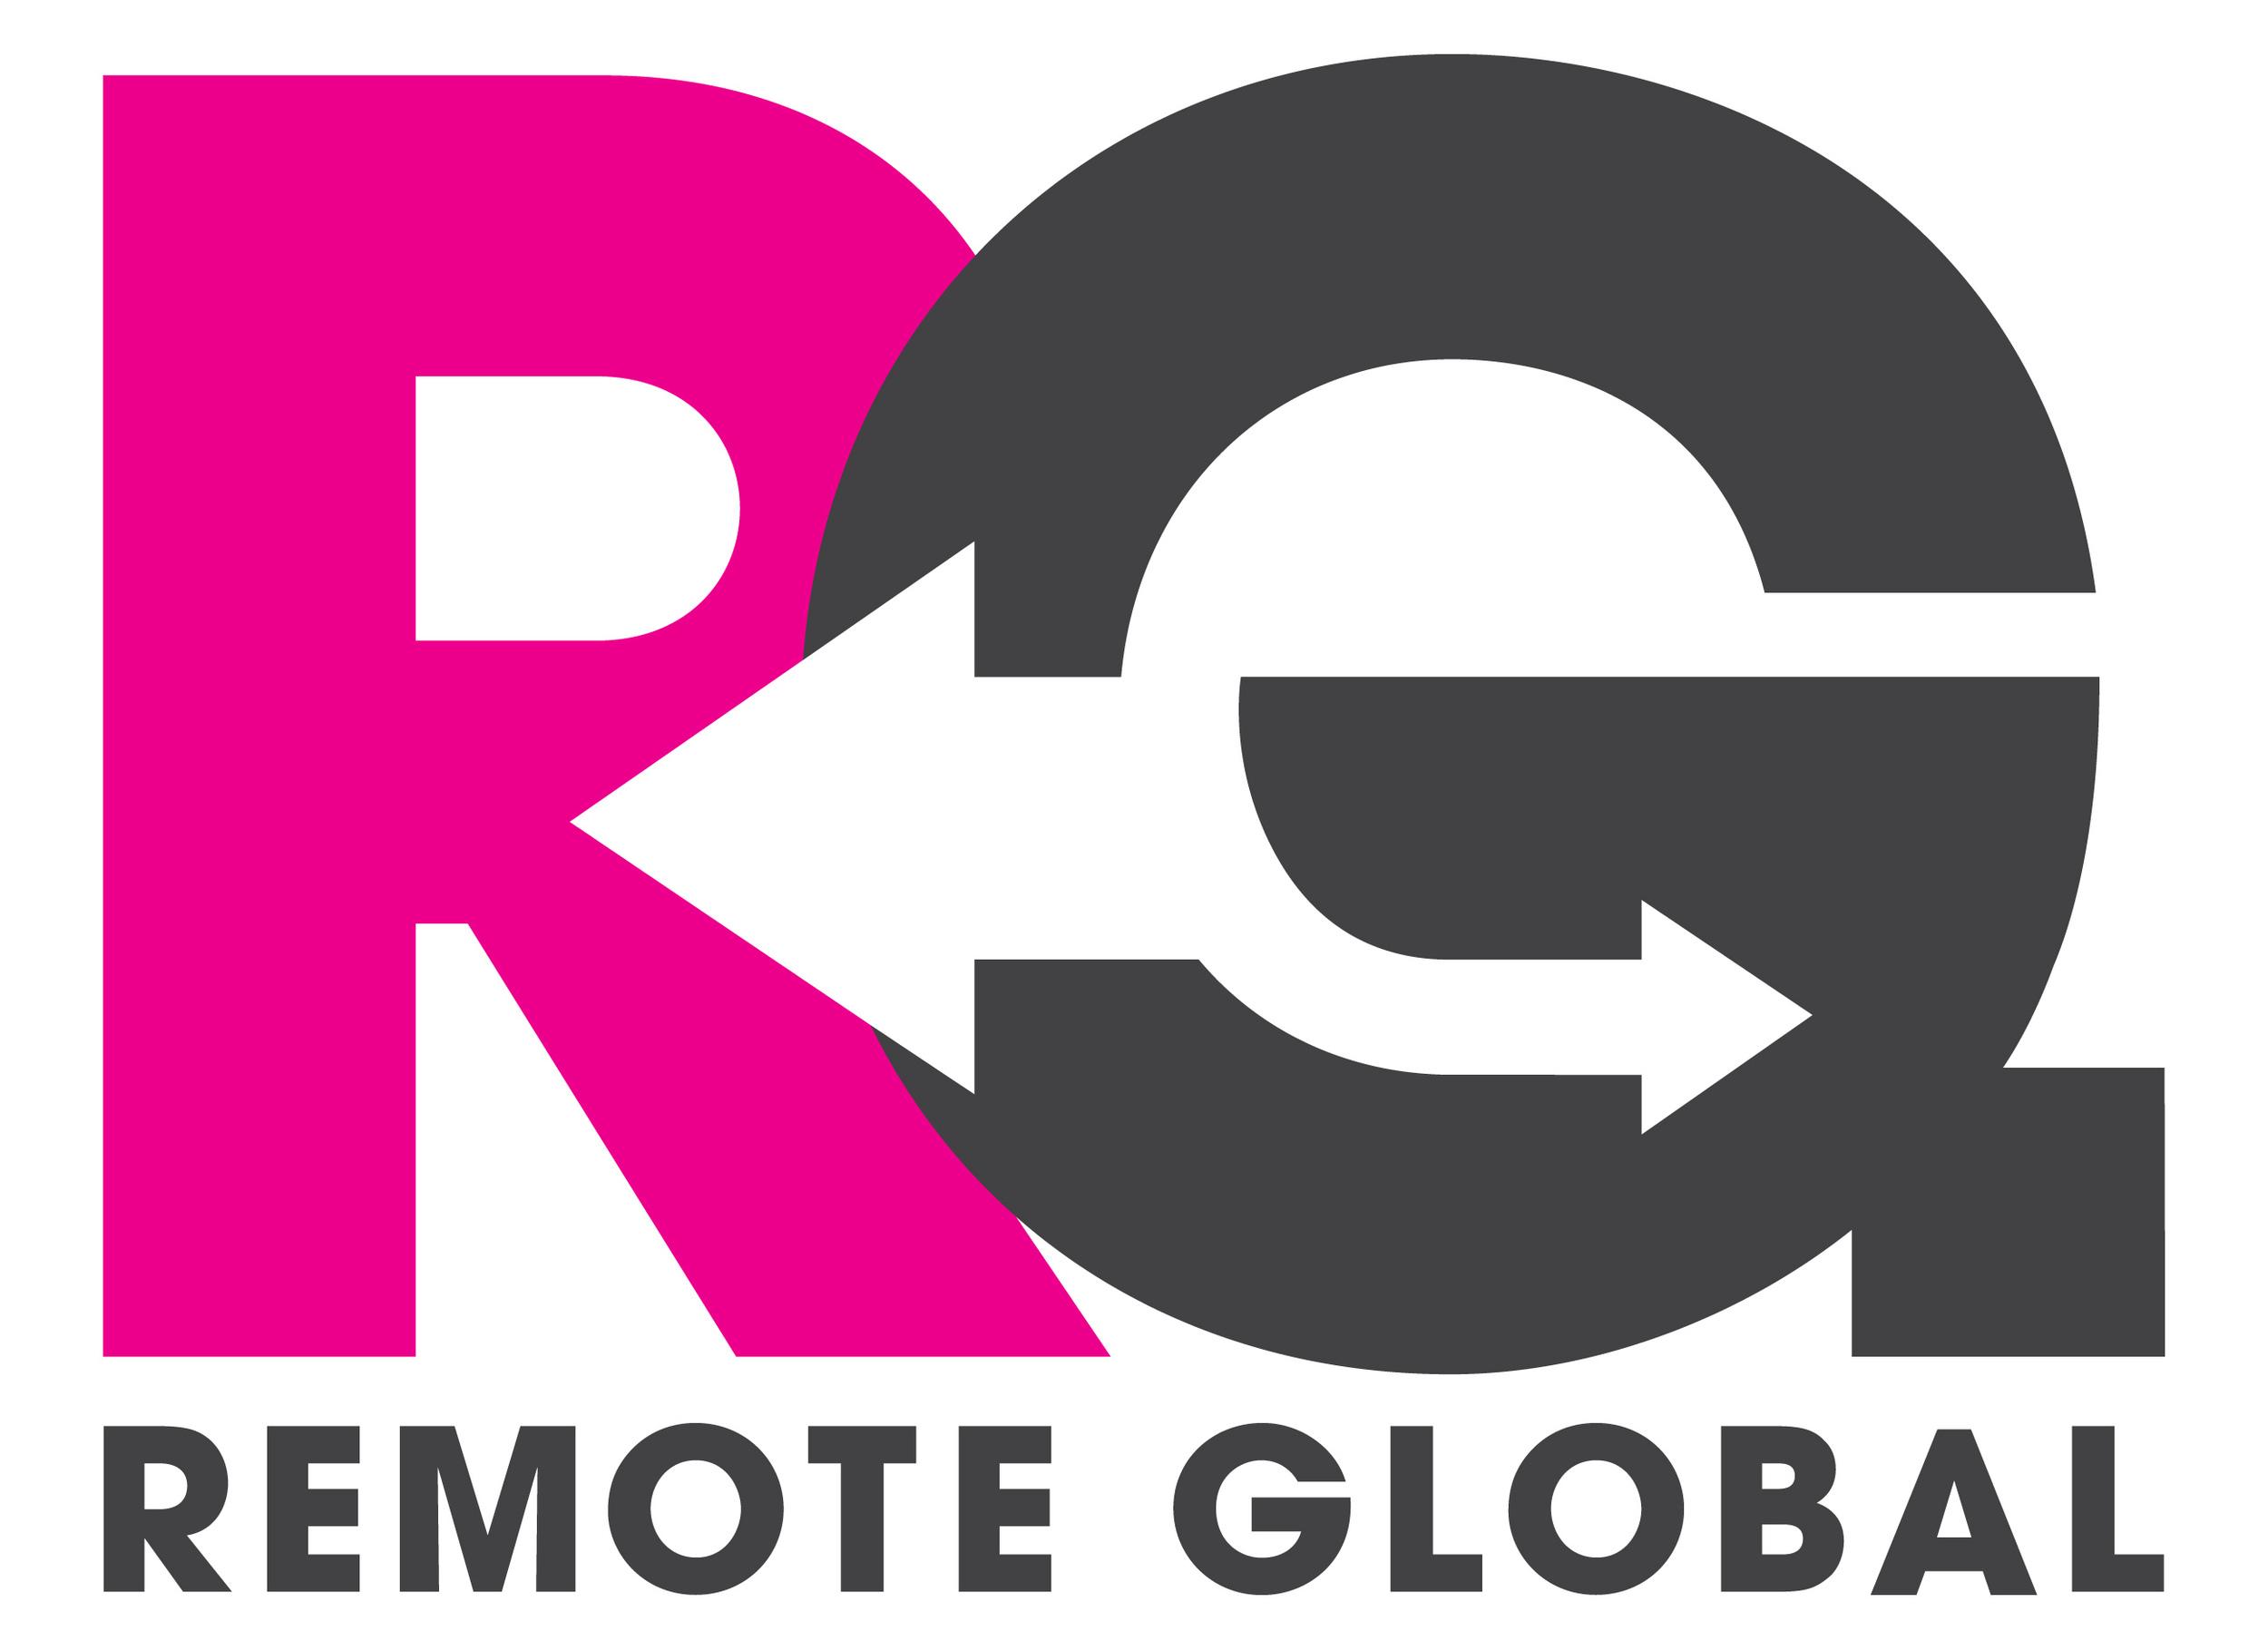 RemoteGlobal_logo_[rgb] mr.jpg